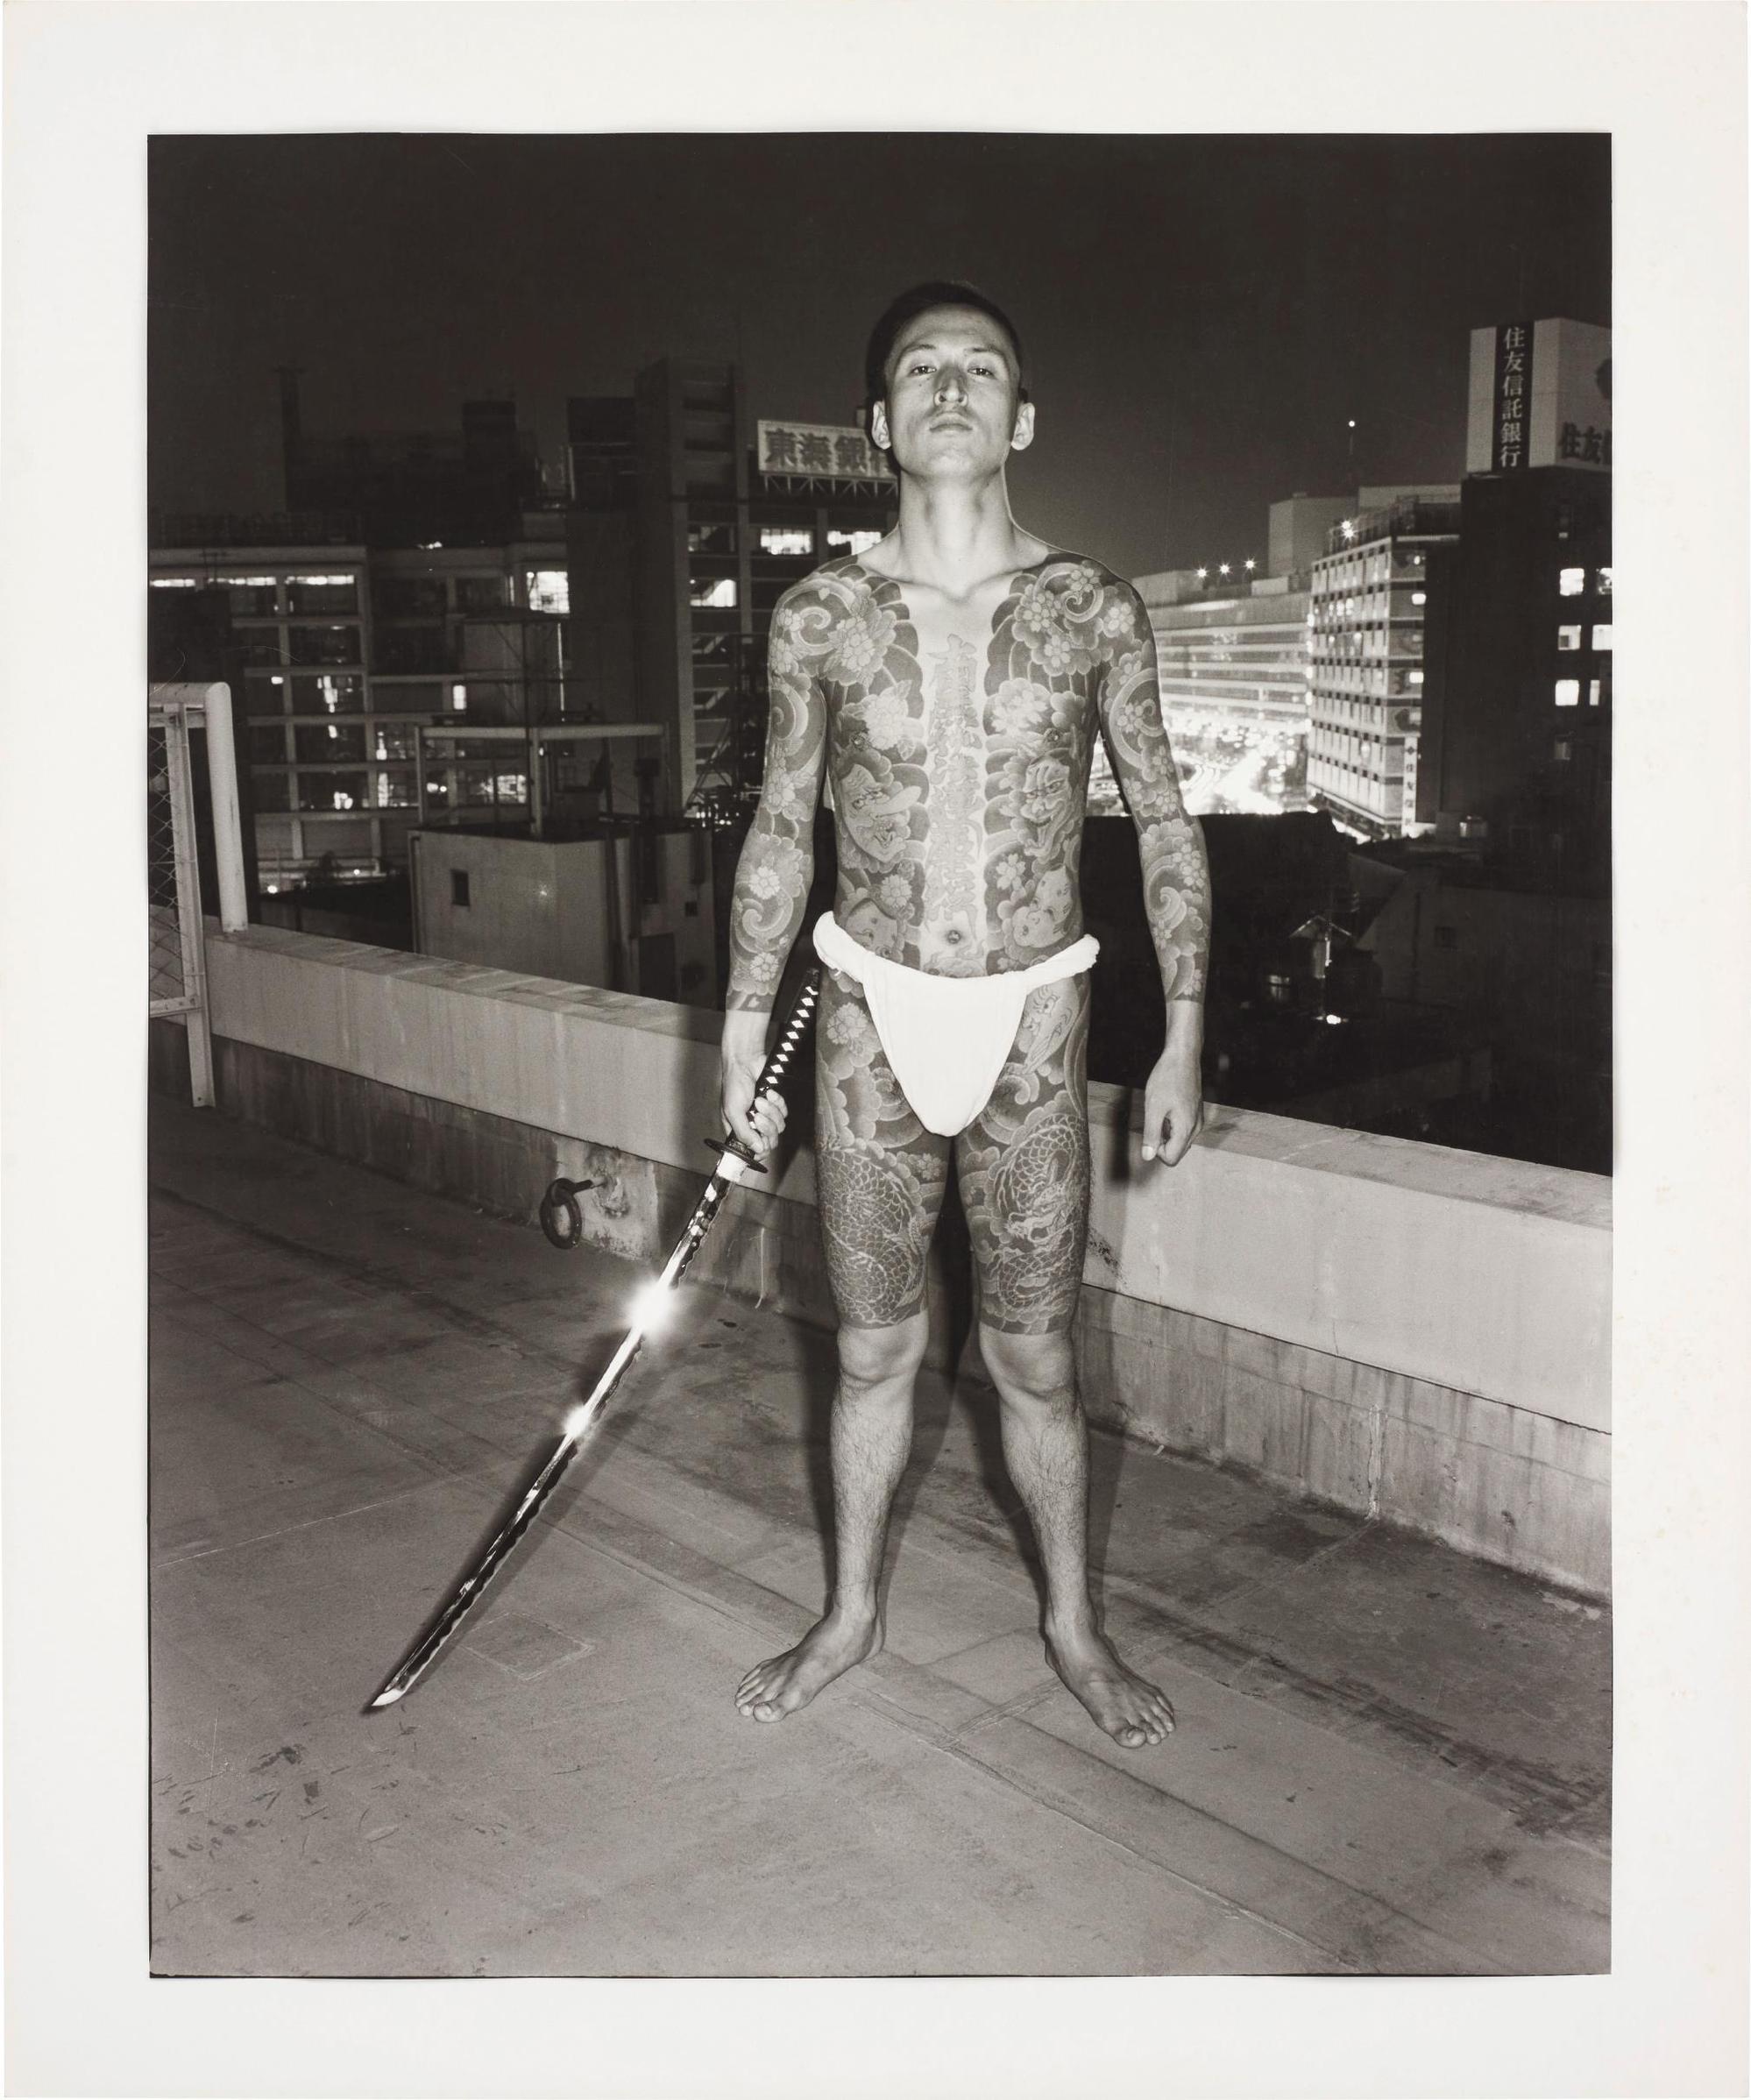 Seiji Kurata - [Irezumi No Otoko] Tattooed Man From Flash Up-1975